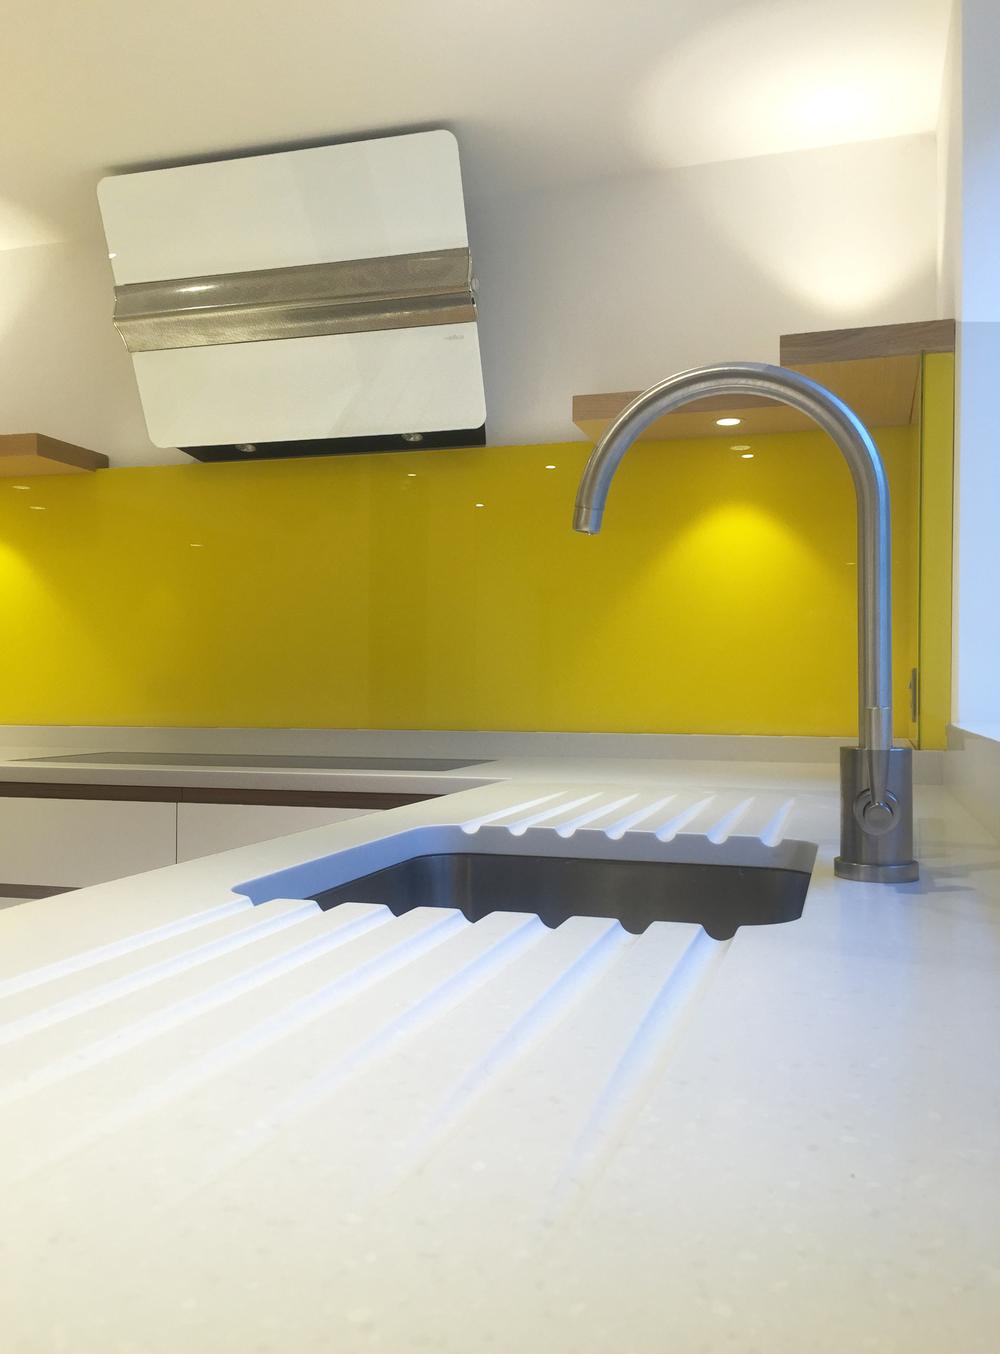 Square-One-Design-kitchen-oak-Antartica-corian-Formica-glass-yellow-2.jpg